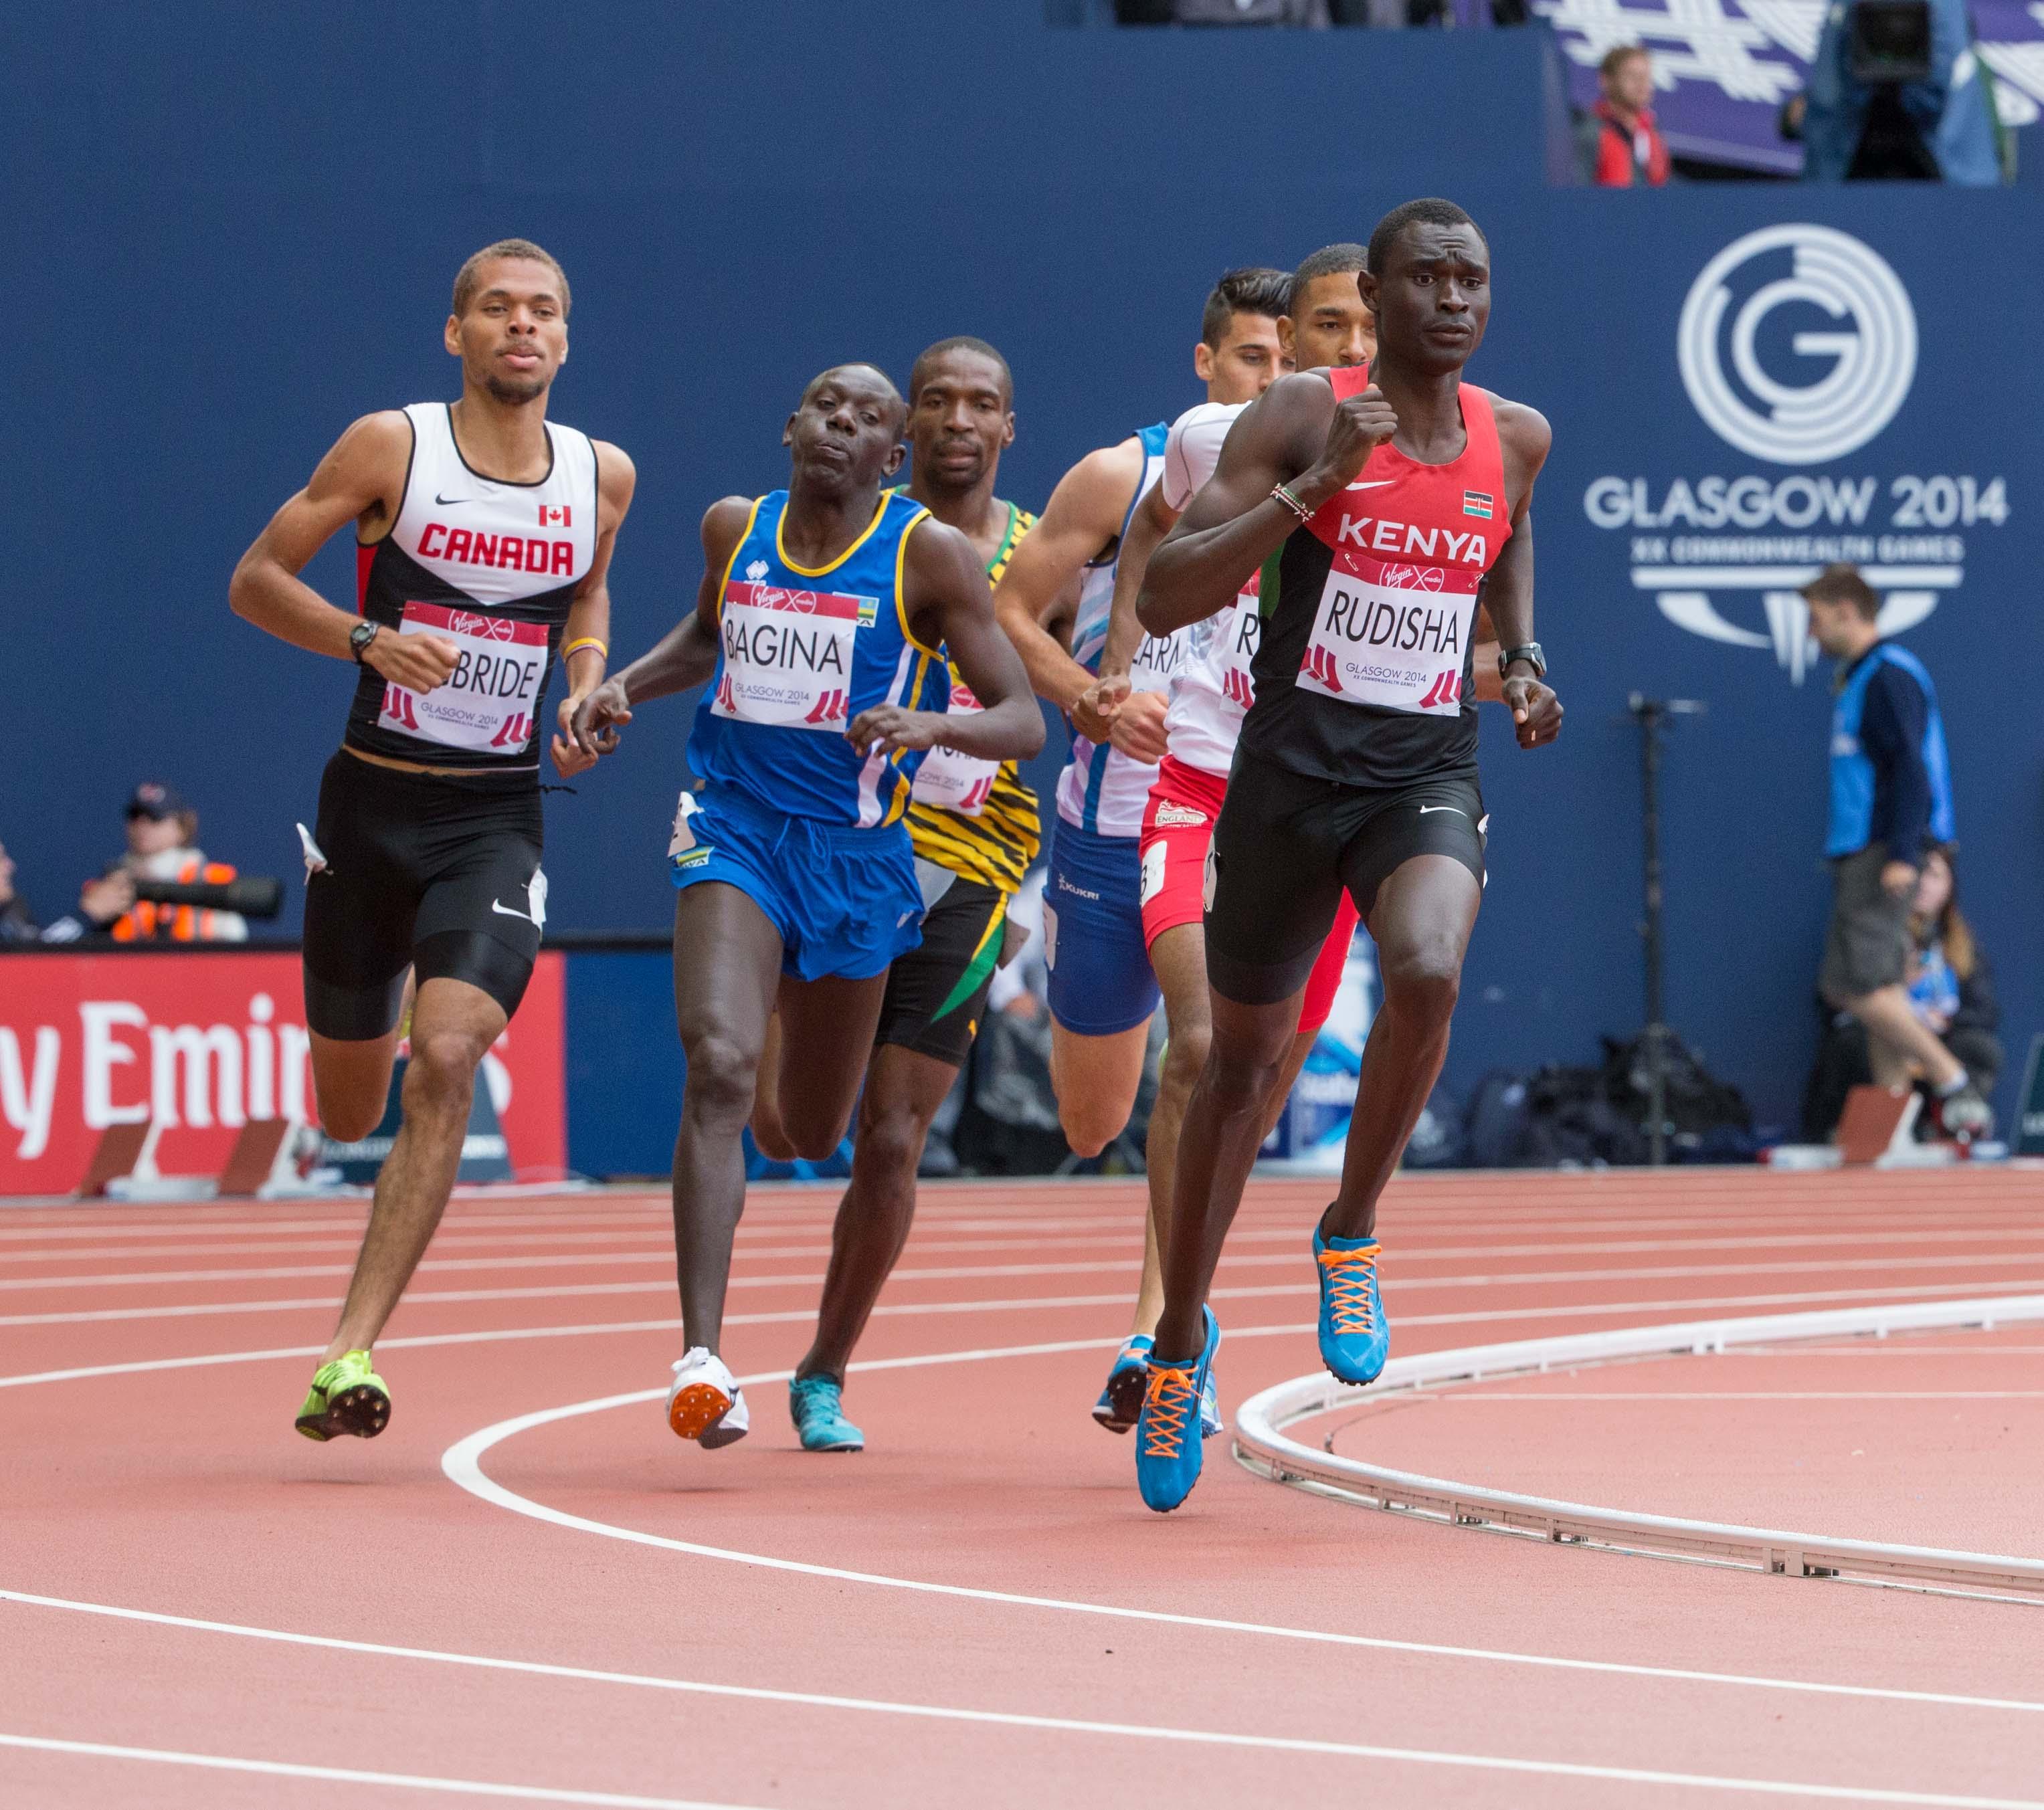 Rio Preview – Men's 800m: Can Rudisha